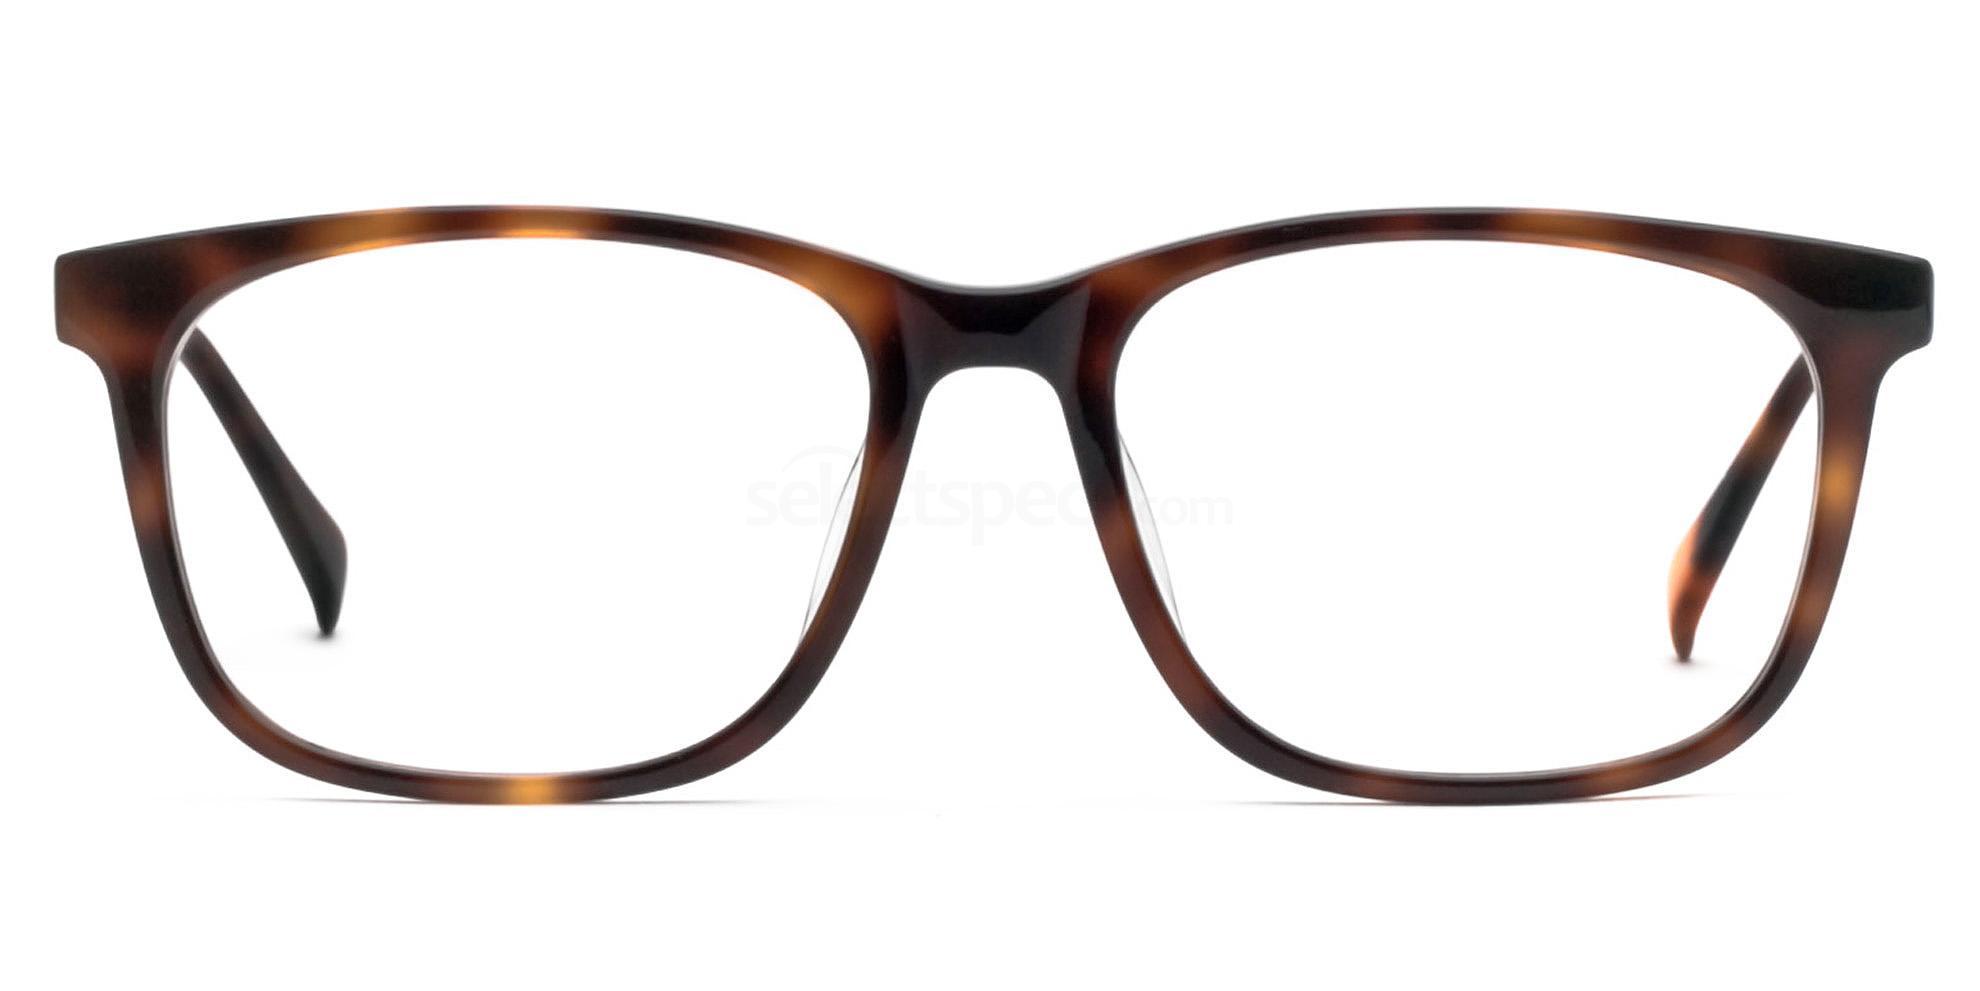 Hallmark B81110 glasses